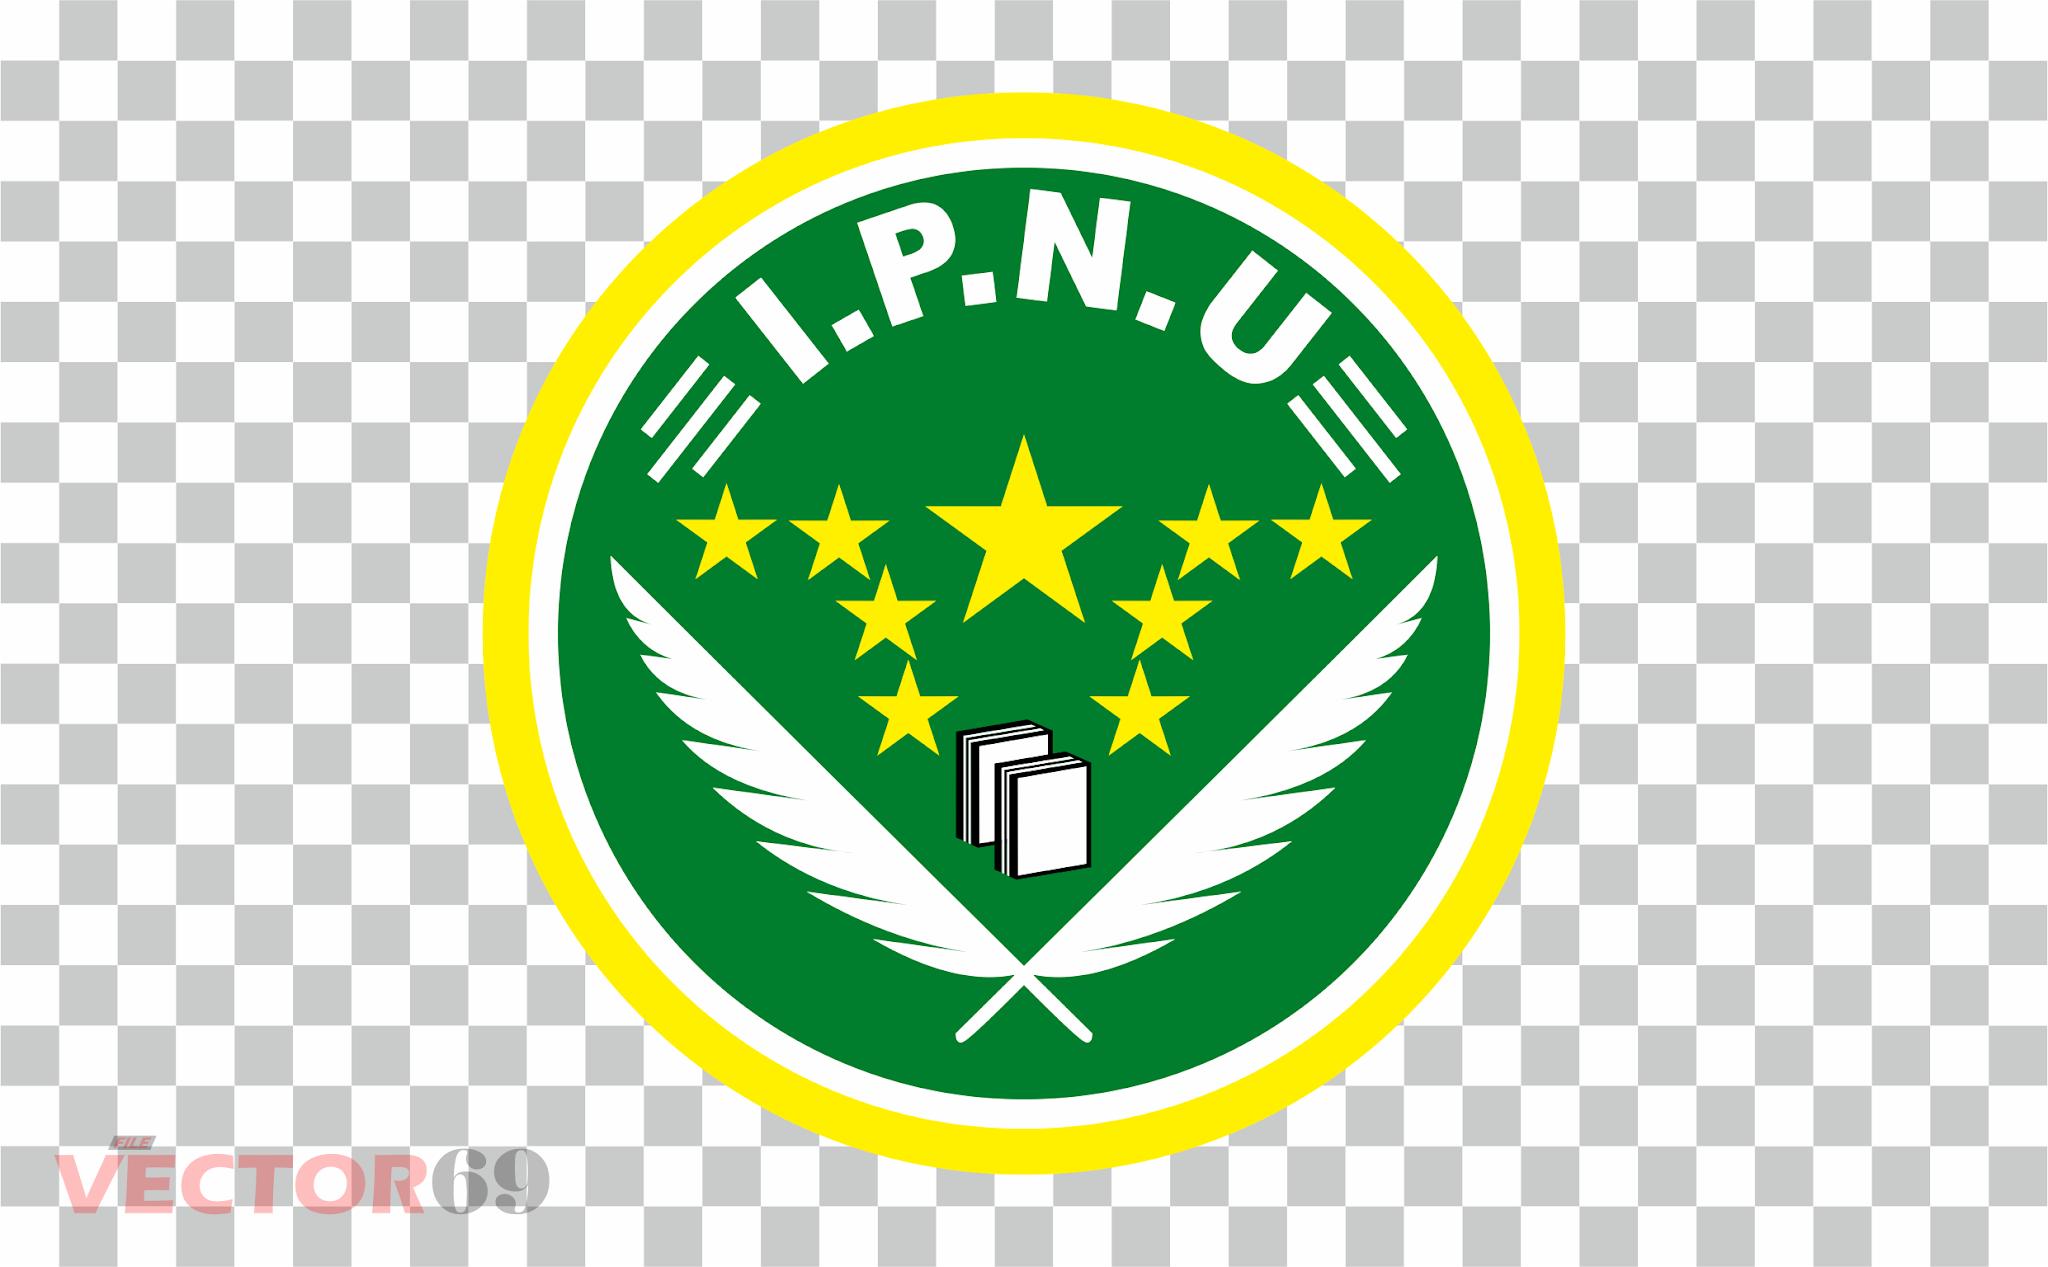 IPNU (Ikatan Pelajar Nahdlatul Ulama) Logo - Download Vector File PNG (Portable Network Graphics)